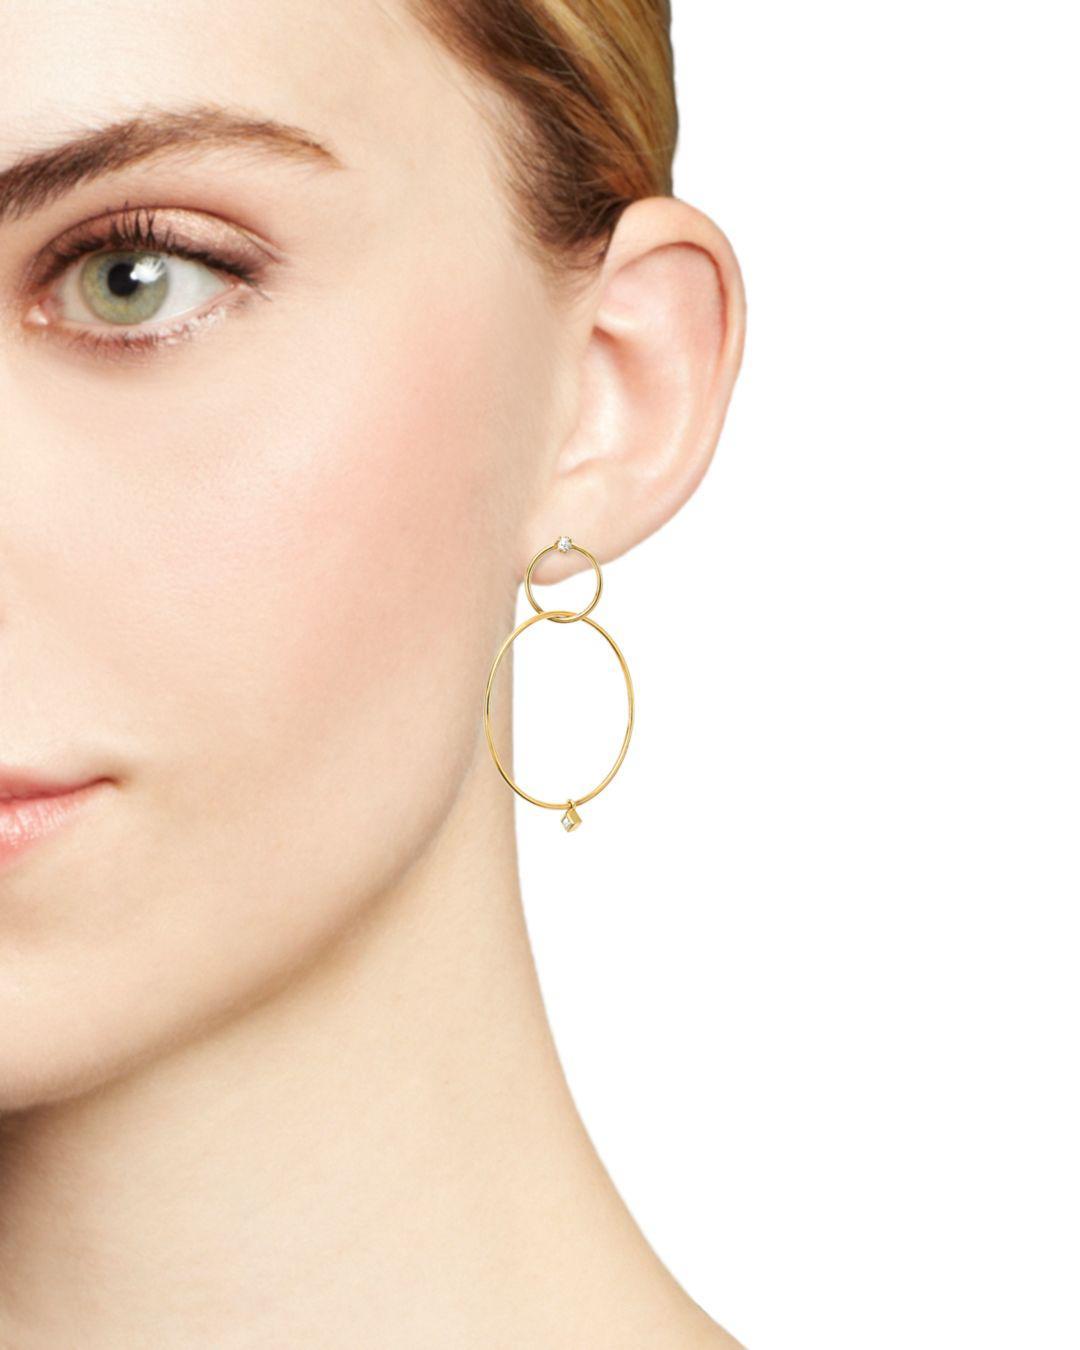 Lyst Zoe Chicco 14k Yellow Gold Mixed Diamond Stud And Hoop Earrings In Metallic